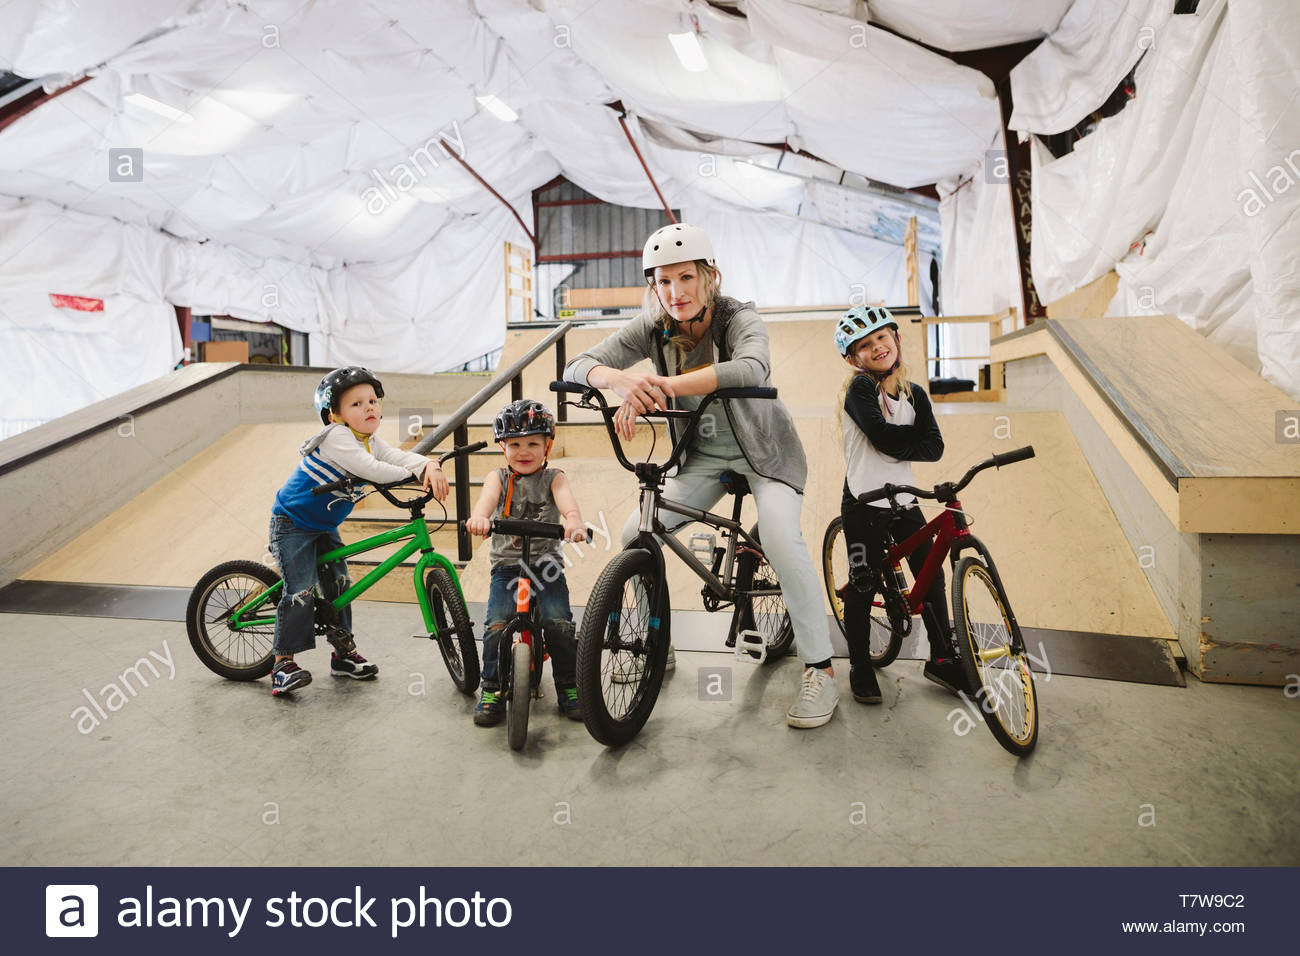 Portrait confident mother and children on bmx bikes at indoor skate park - Stock Image